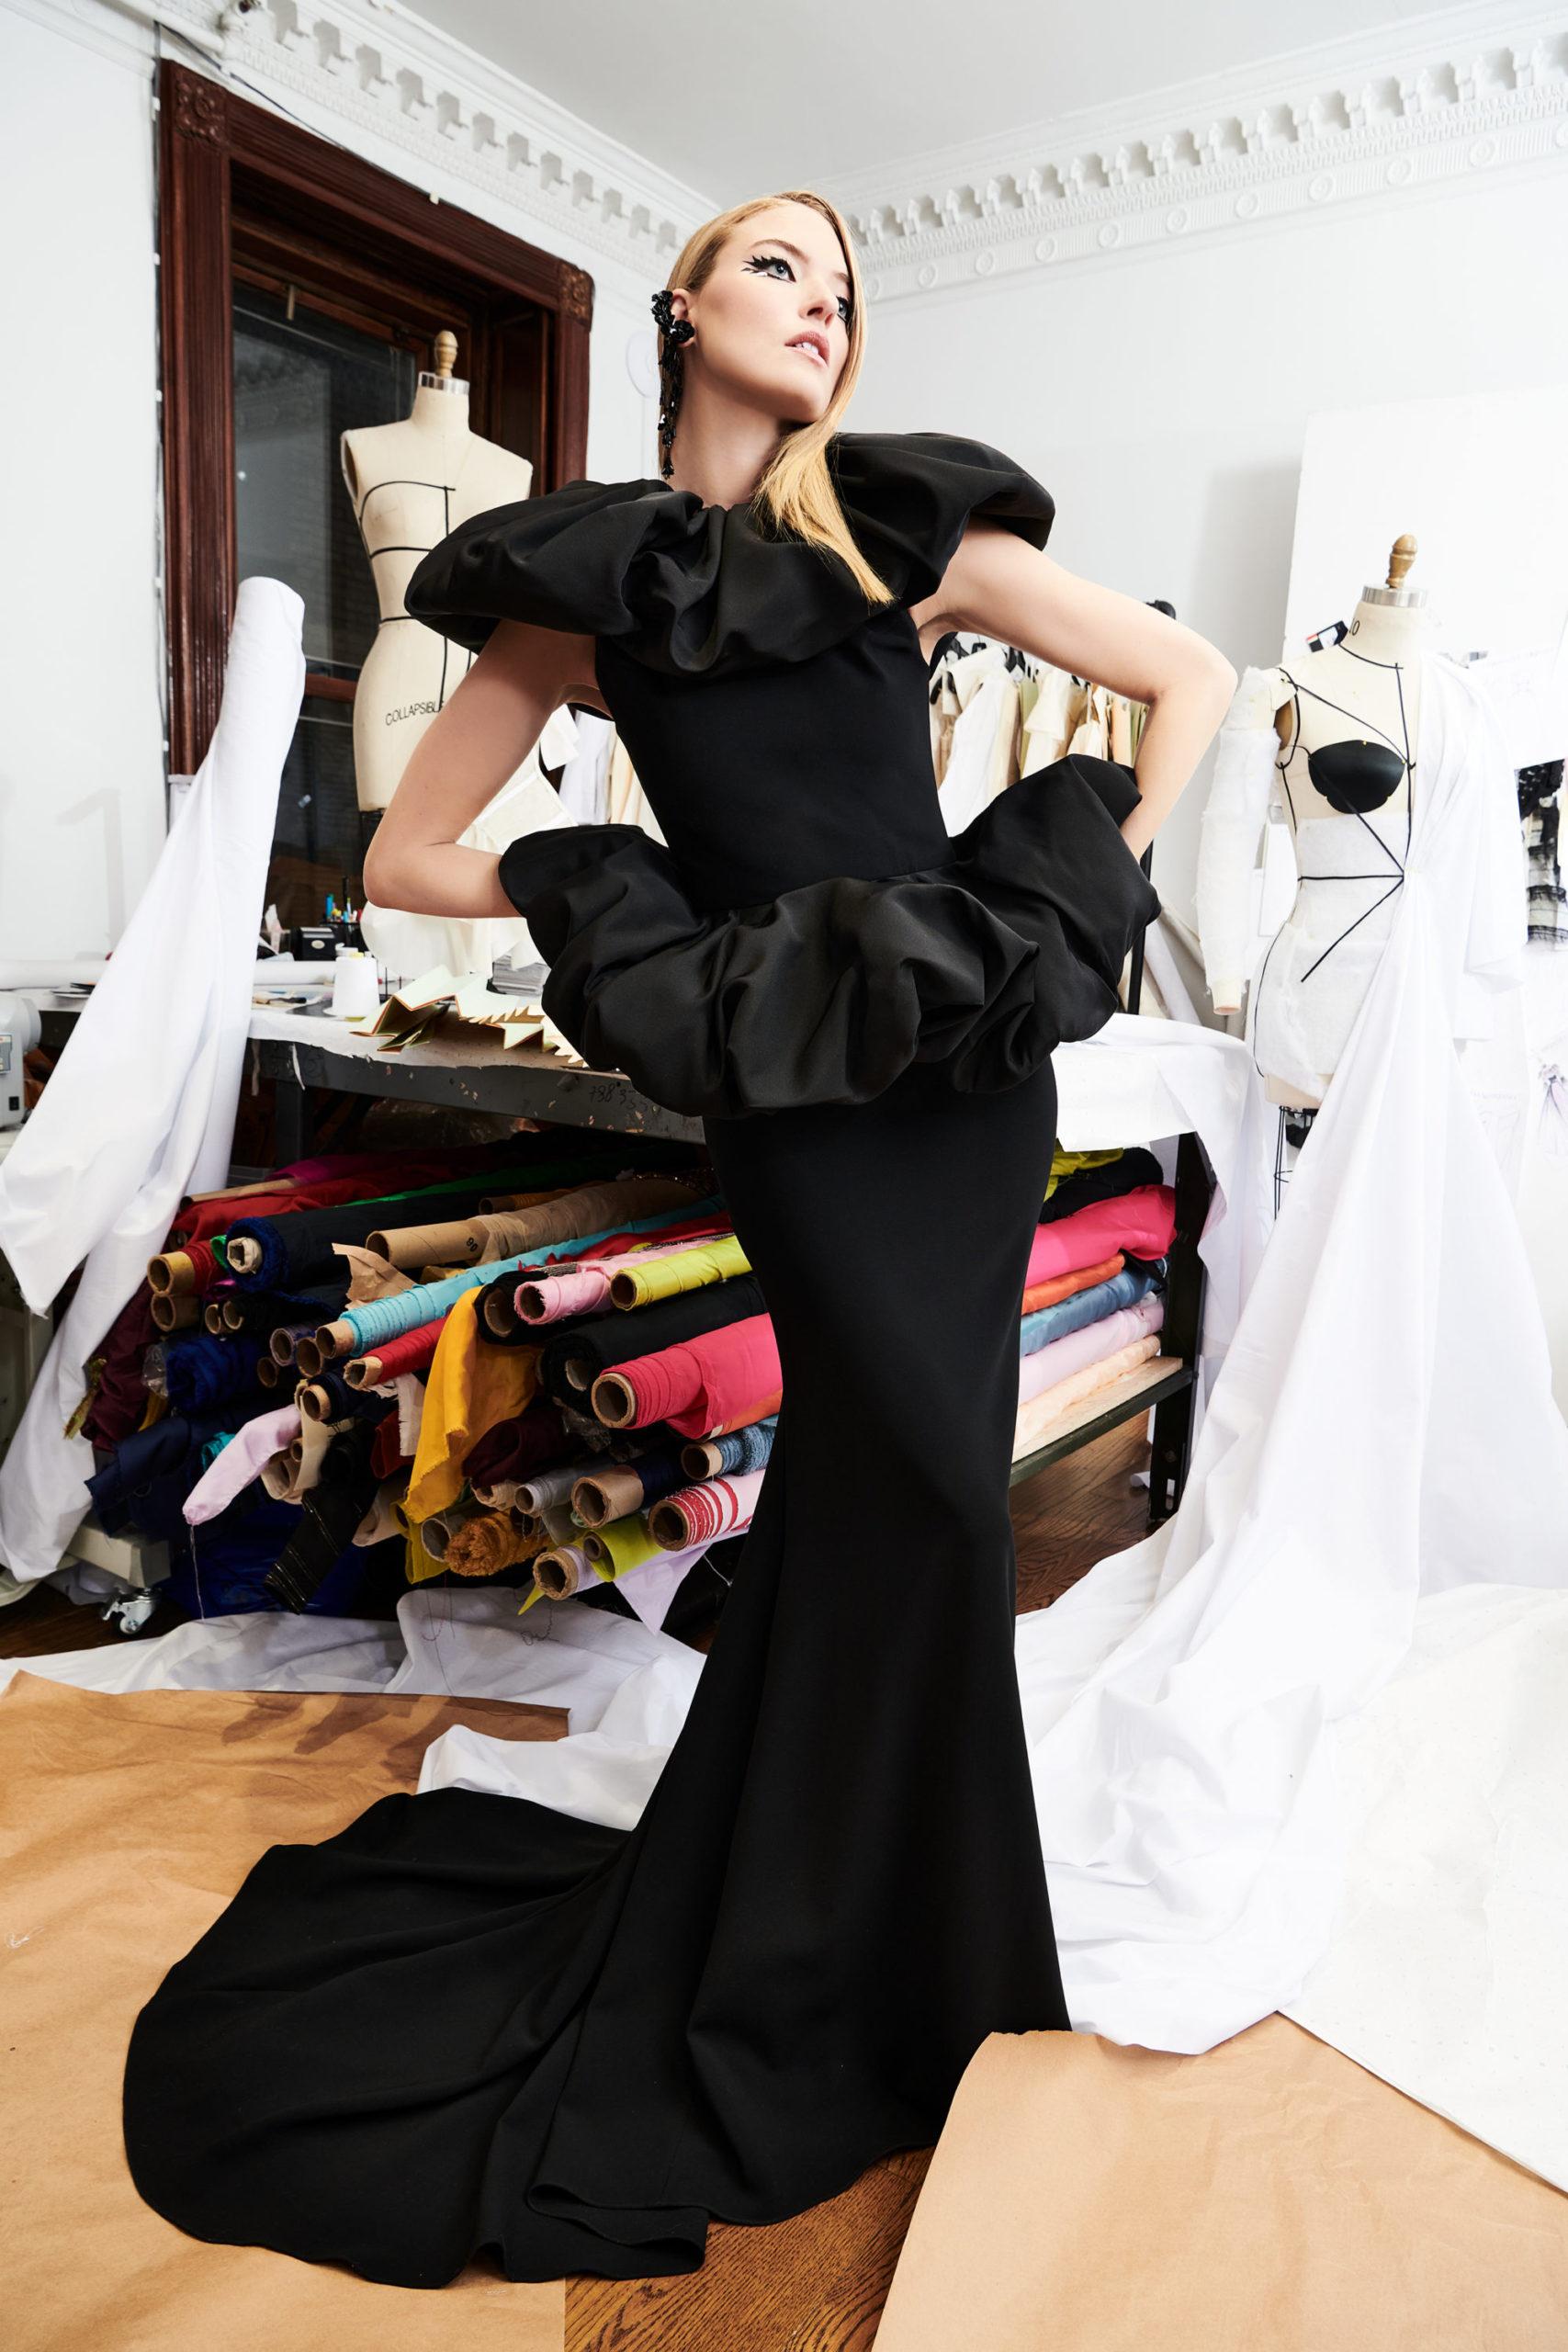 Платье с баской от Christian Siriano модель 2022 года